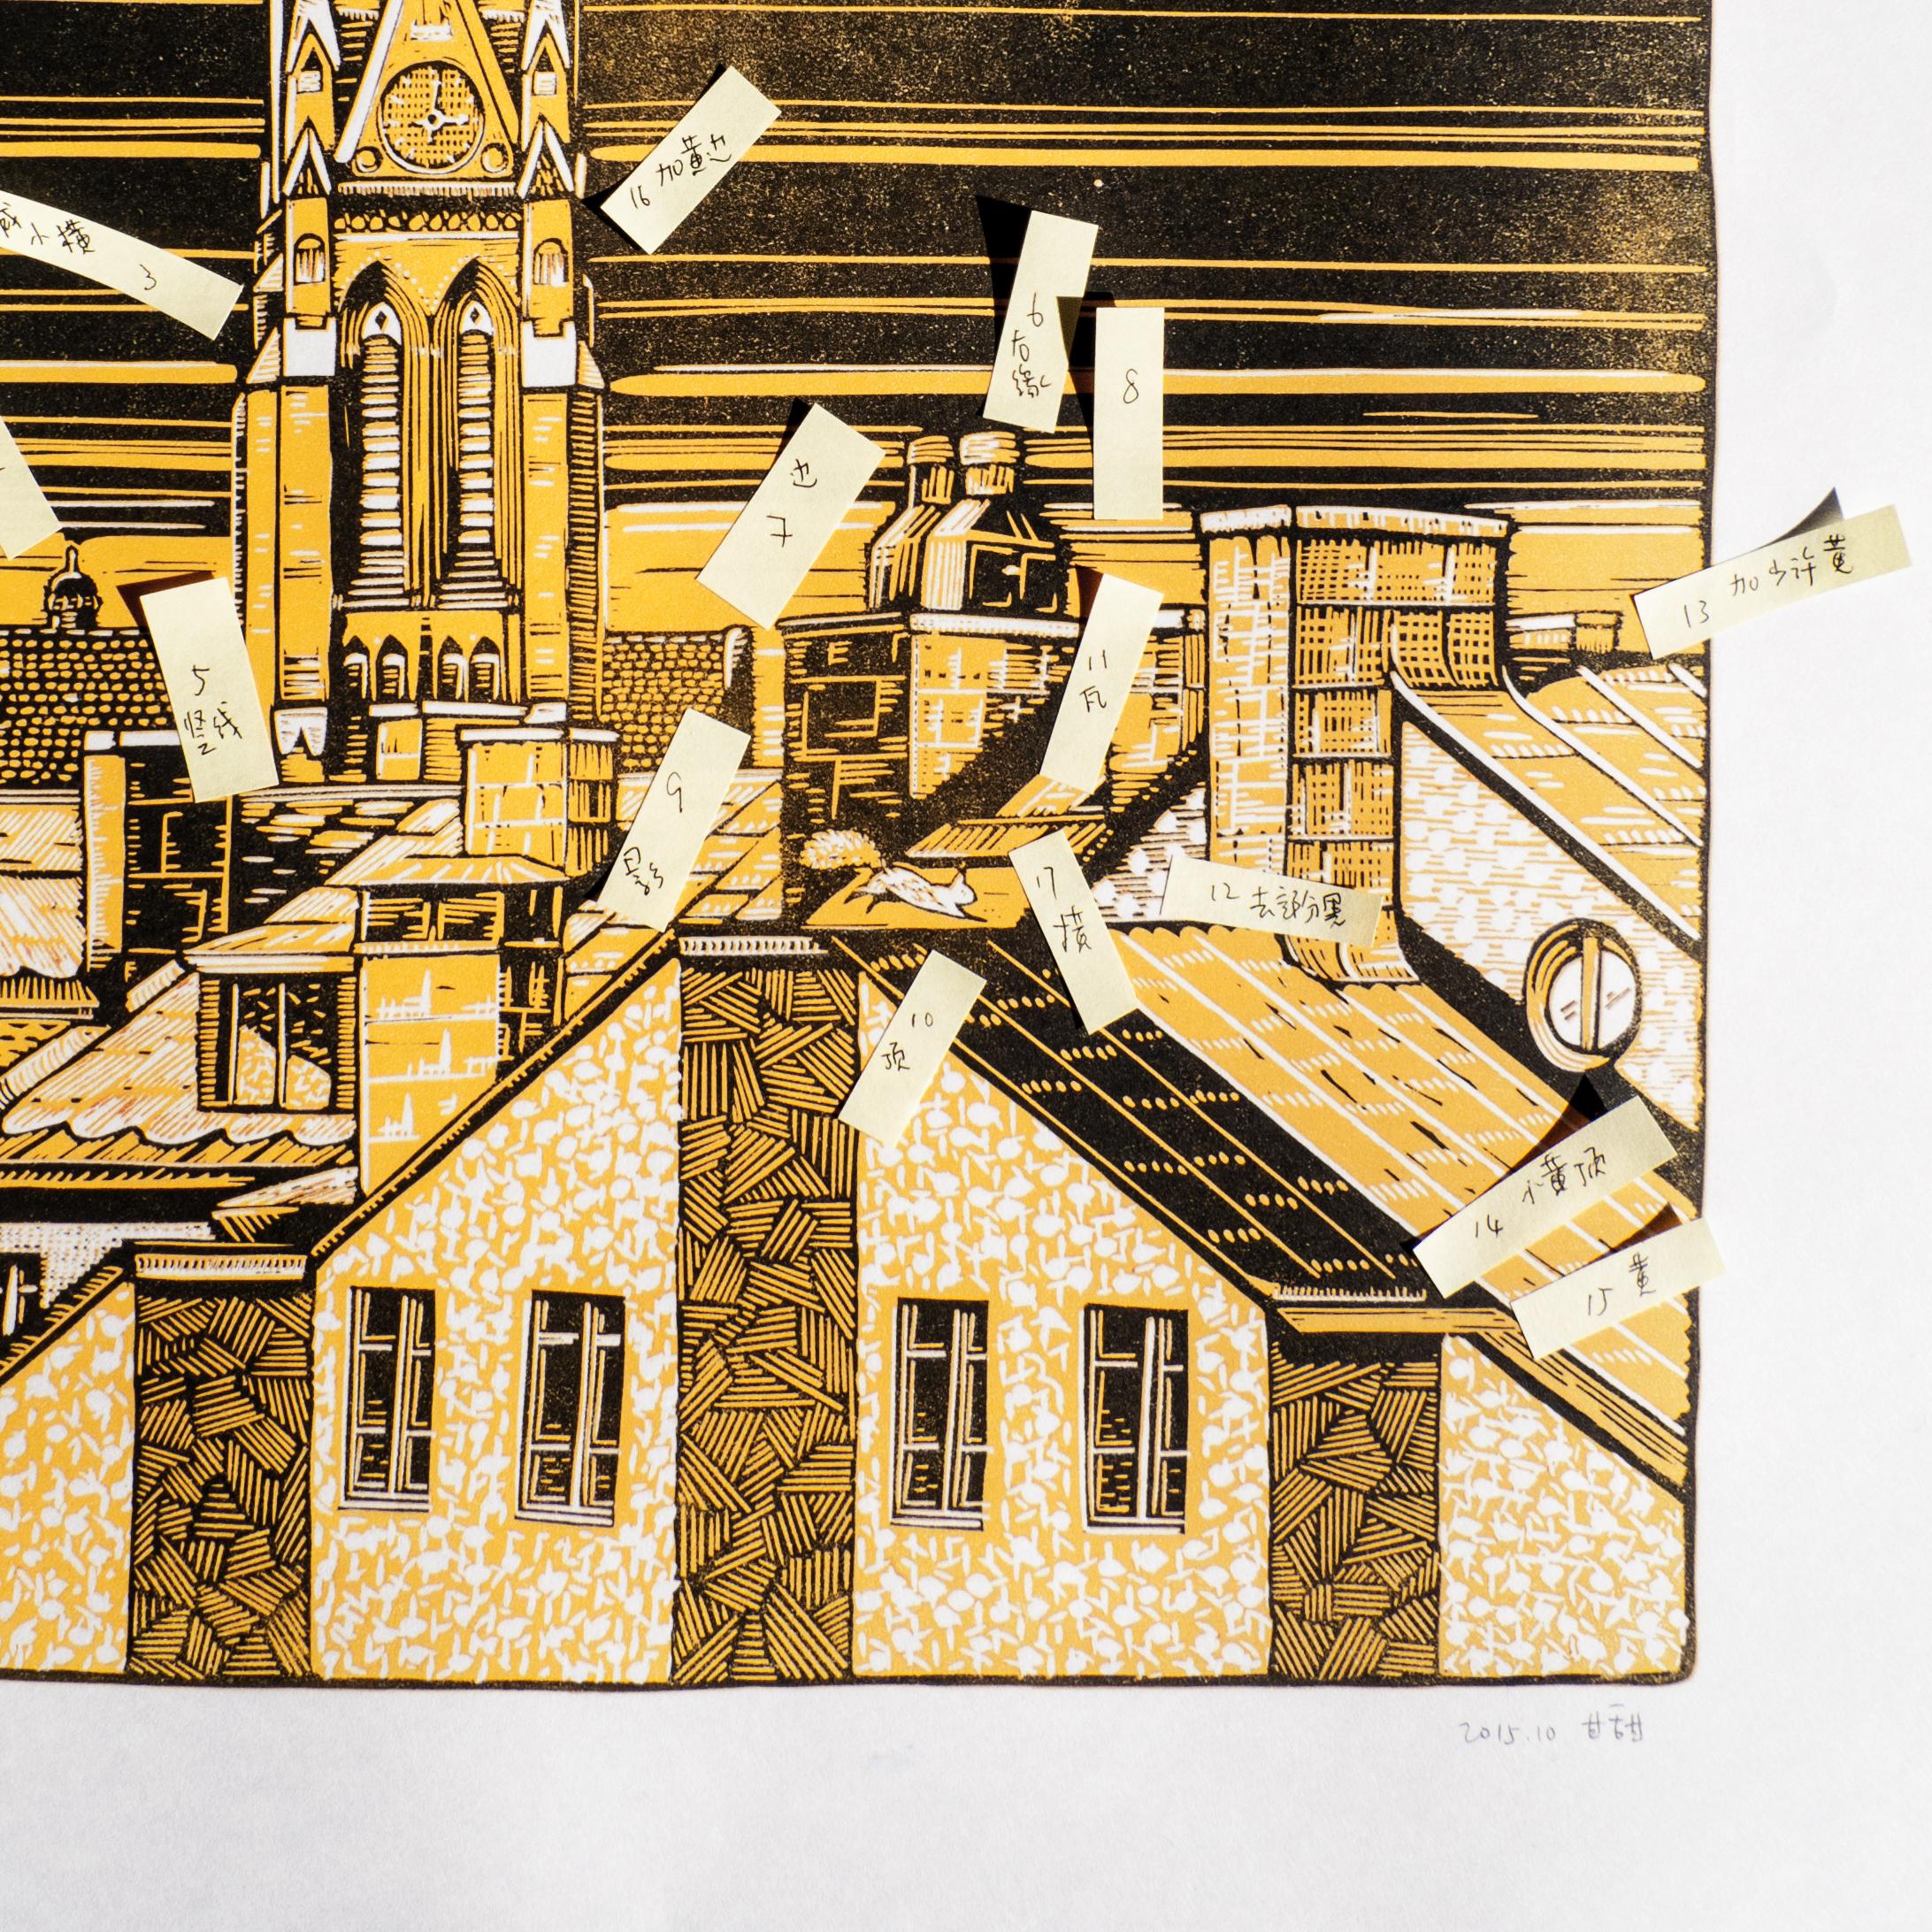 stockholm-st-johannes-kyrka-church-reduction-linocut-proofing.jpg